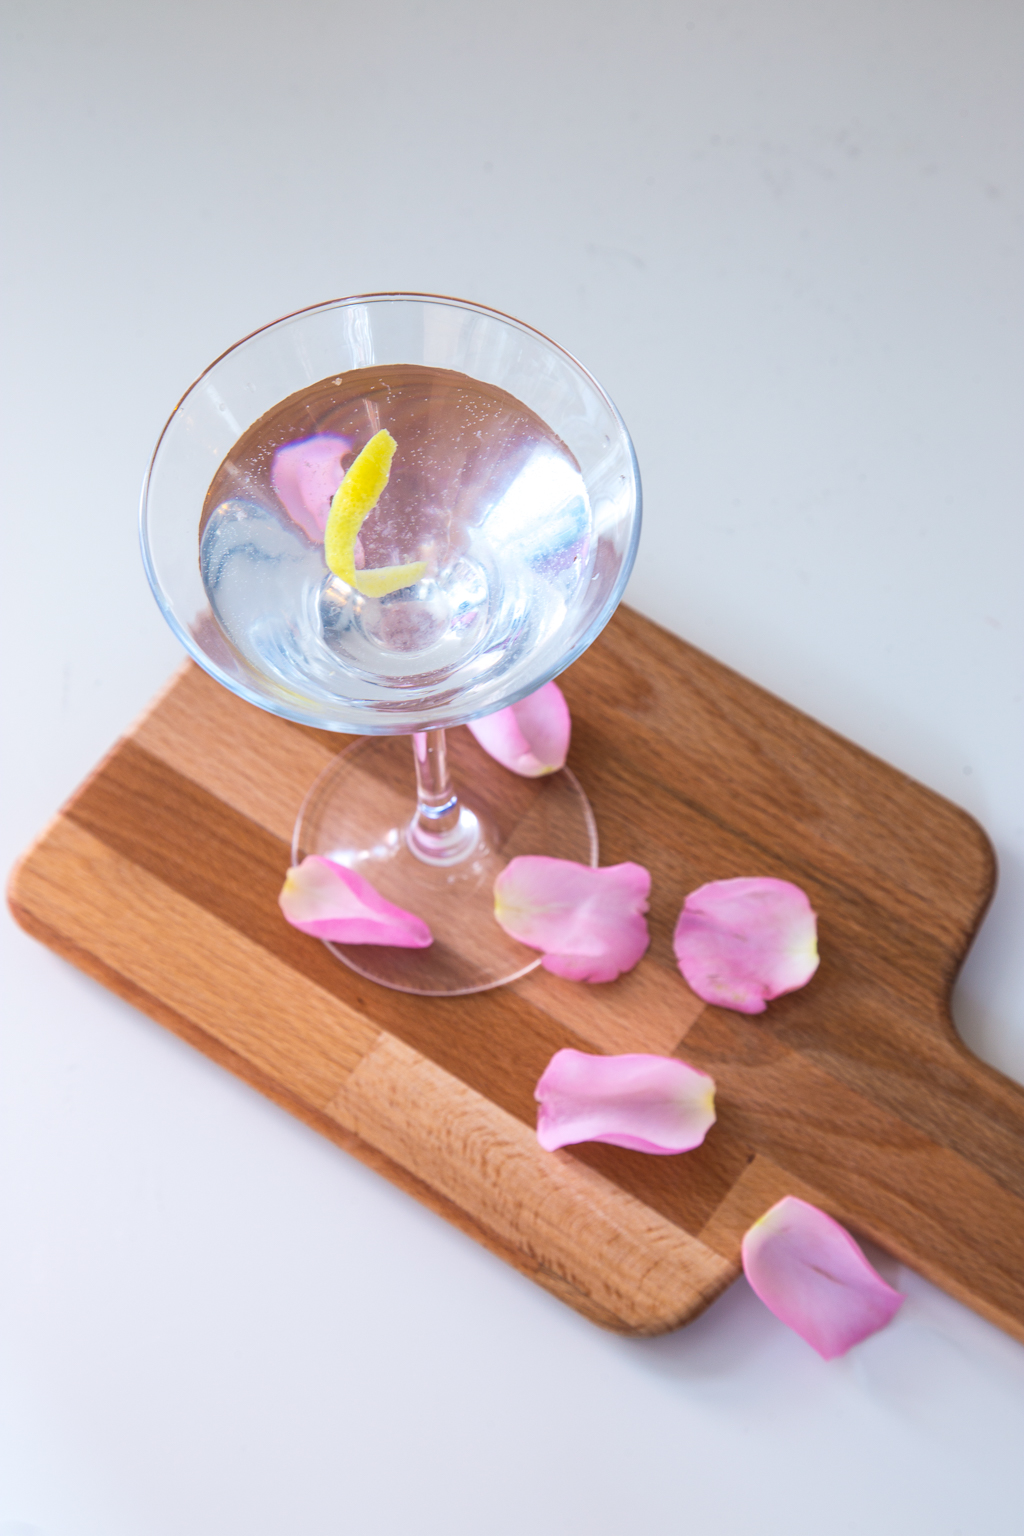 Rose gin martini